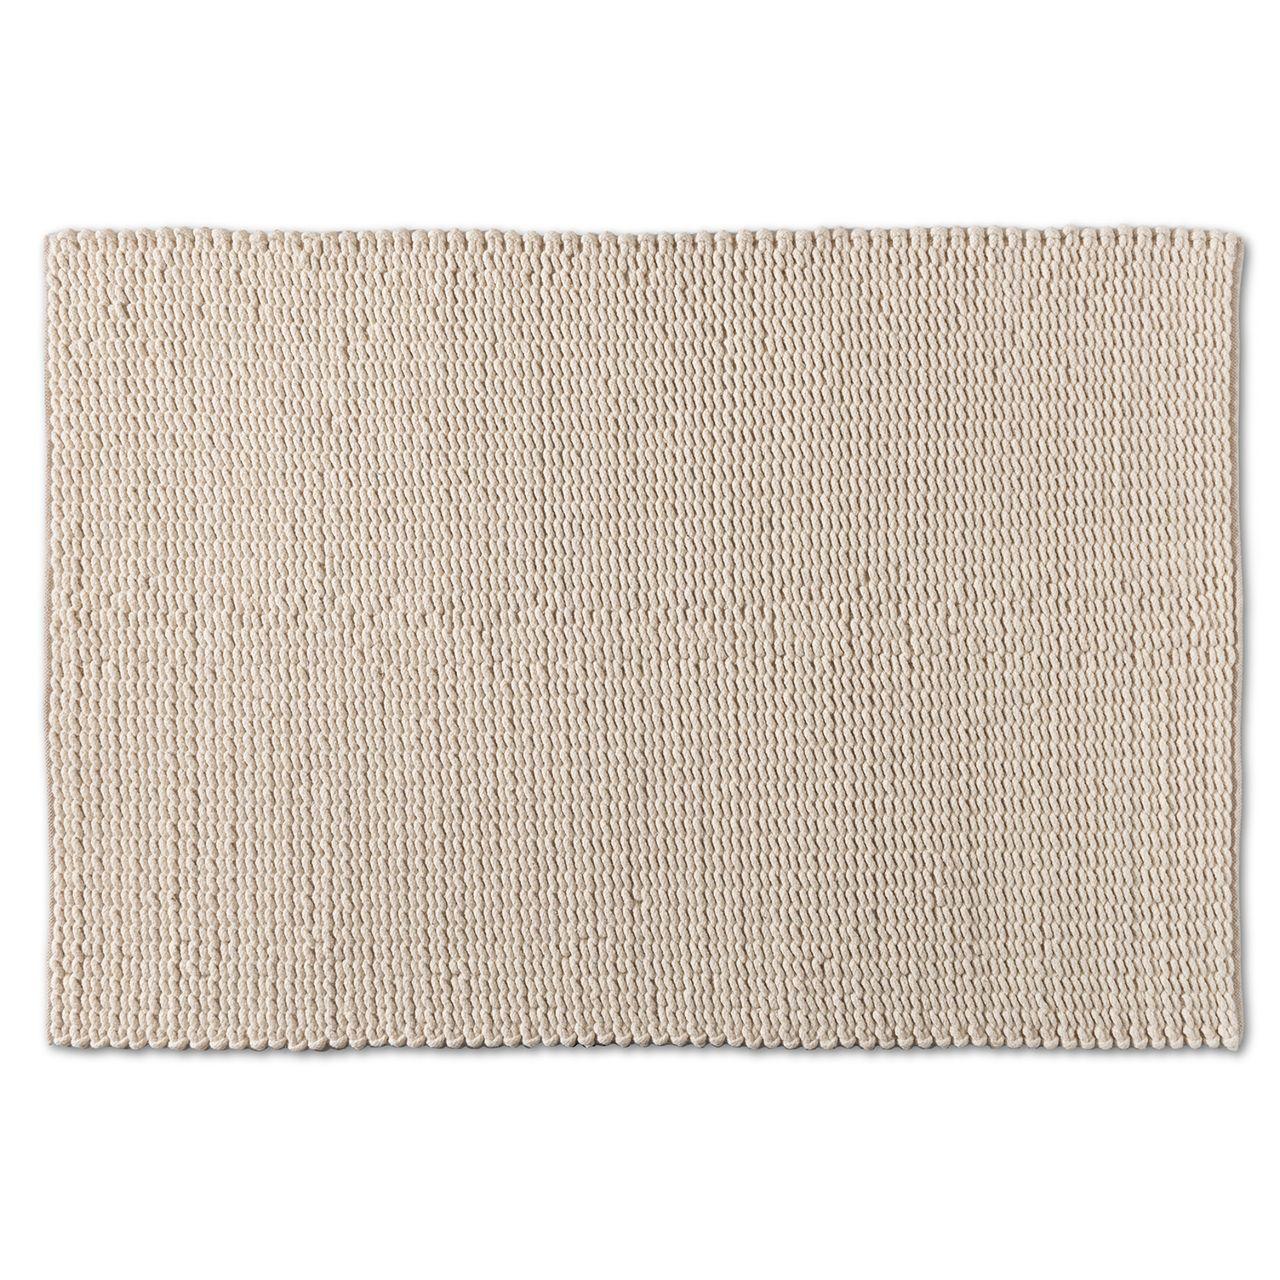 Baxton Studio Alvero Ivory Handwoven Wool Blend Area Rug